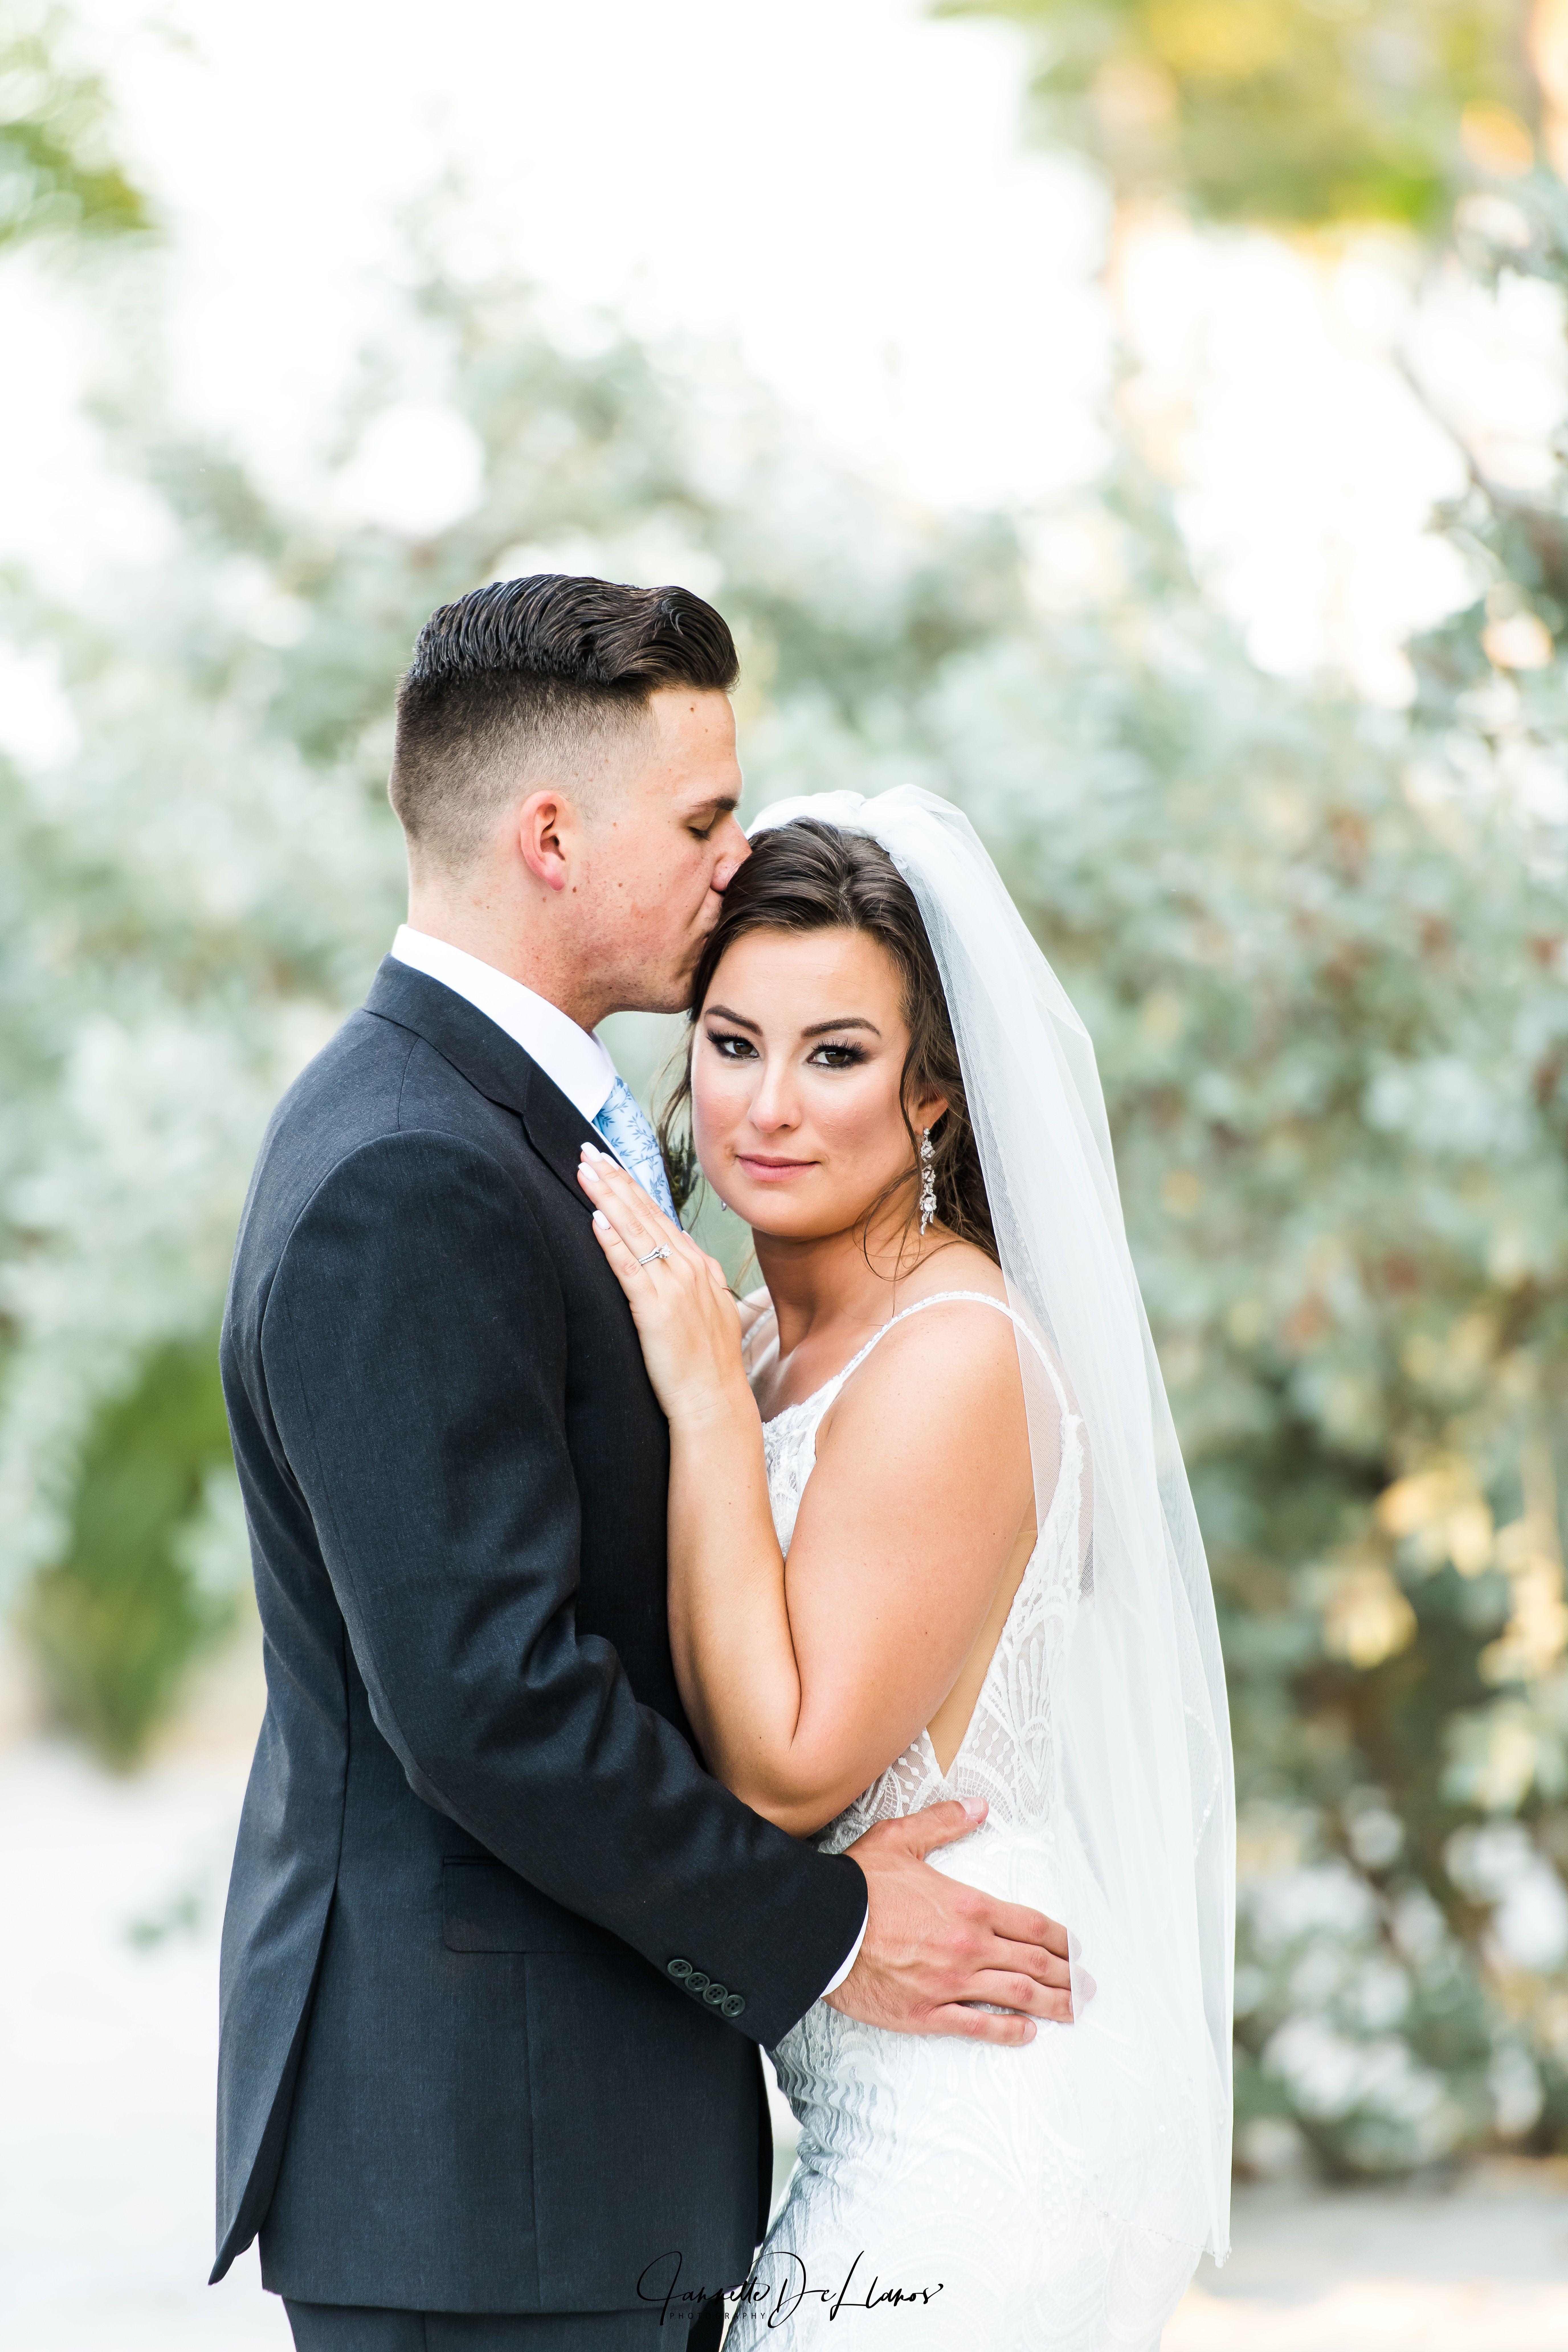 South Florida Wedding Photographer South Florida Wedding Photographer Florida Wedding Photographer South Florida Wedding